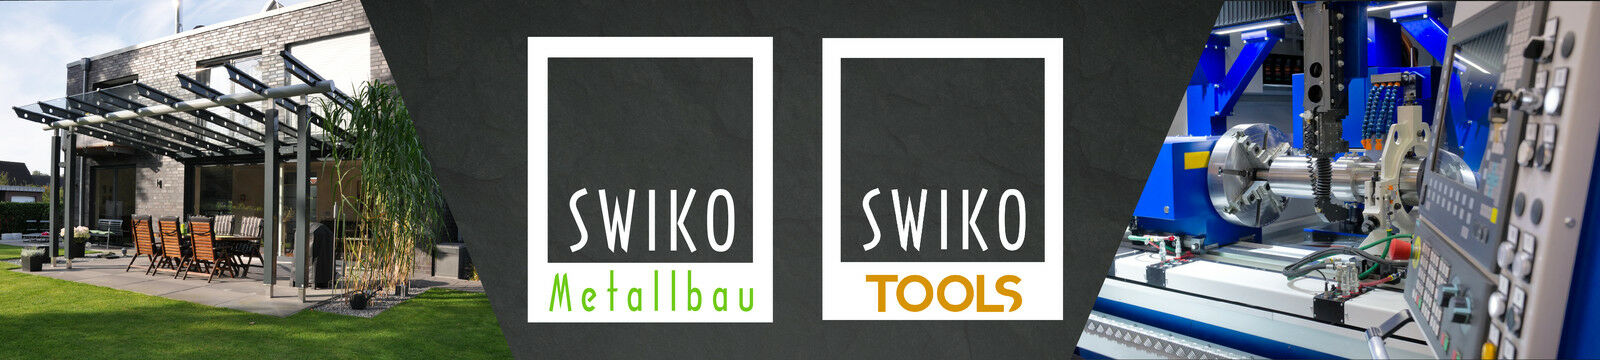 swikotools